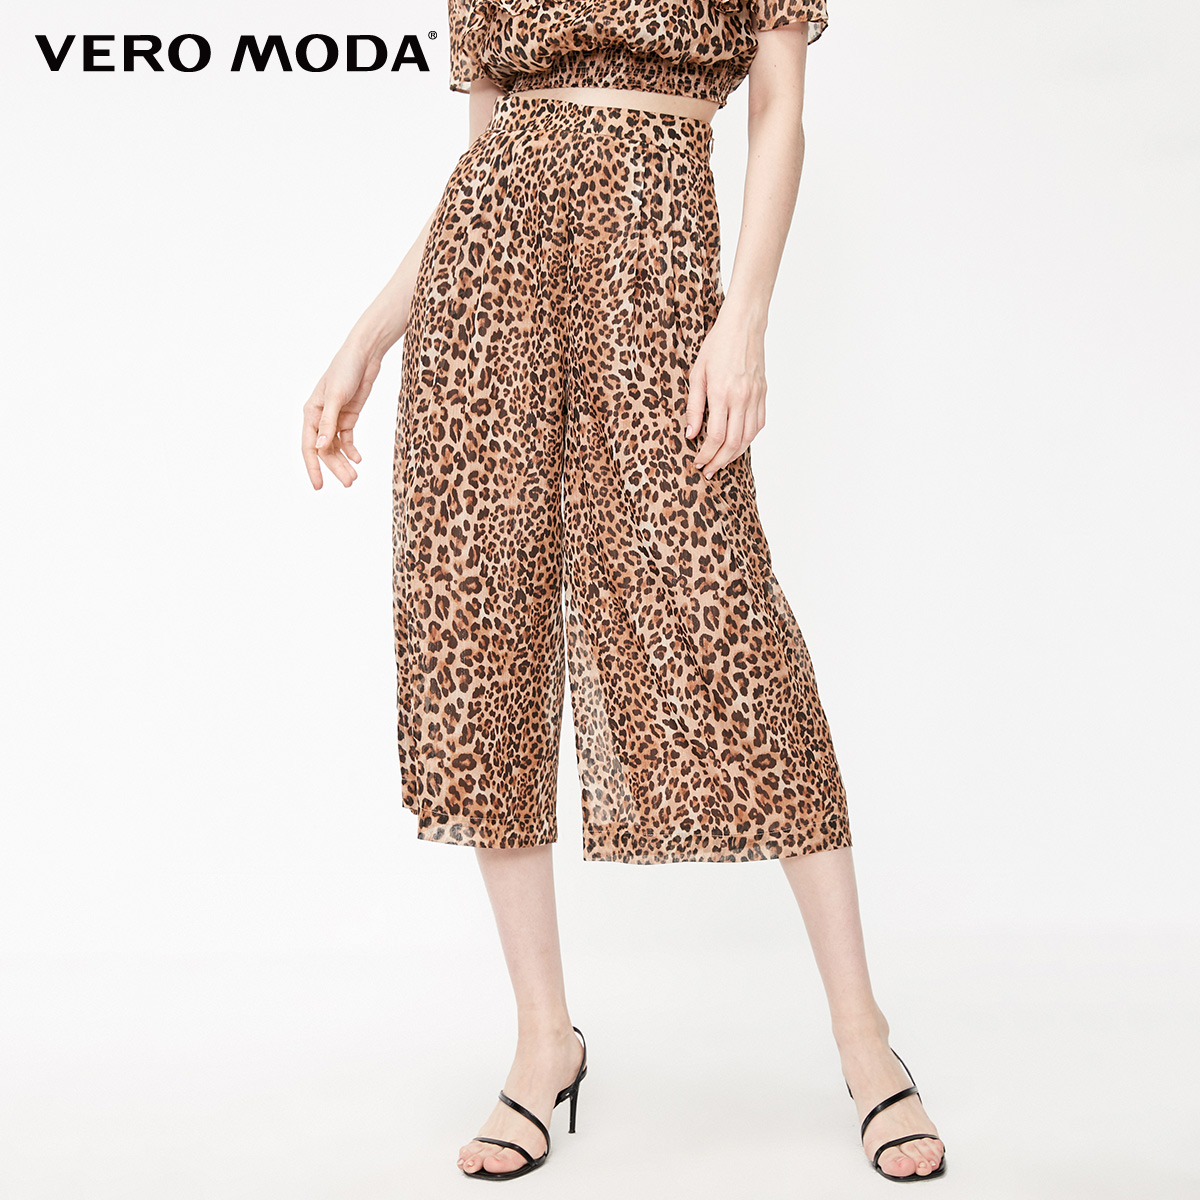 Vero Moda Women's Women's Leopard Print High-rise Capri Pants   31926J529